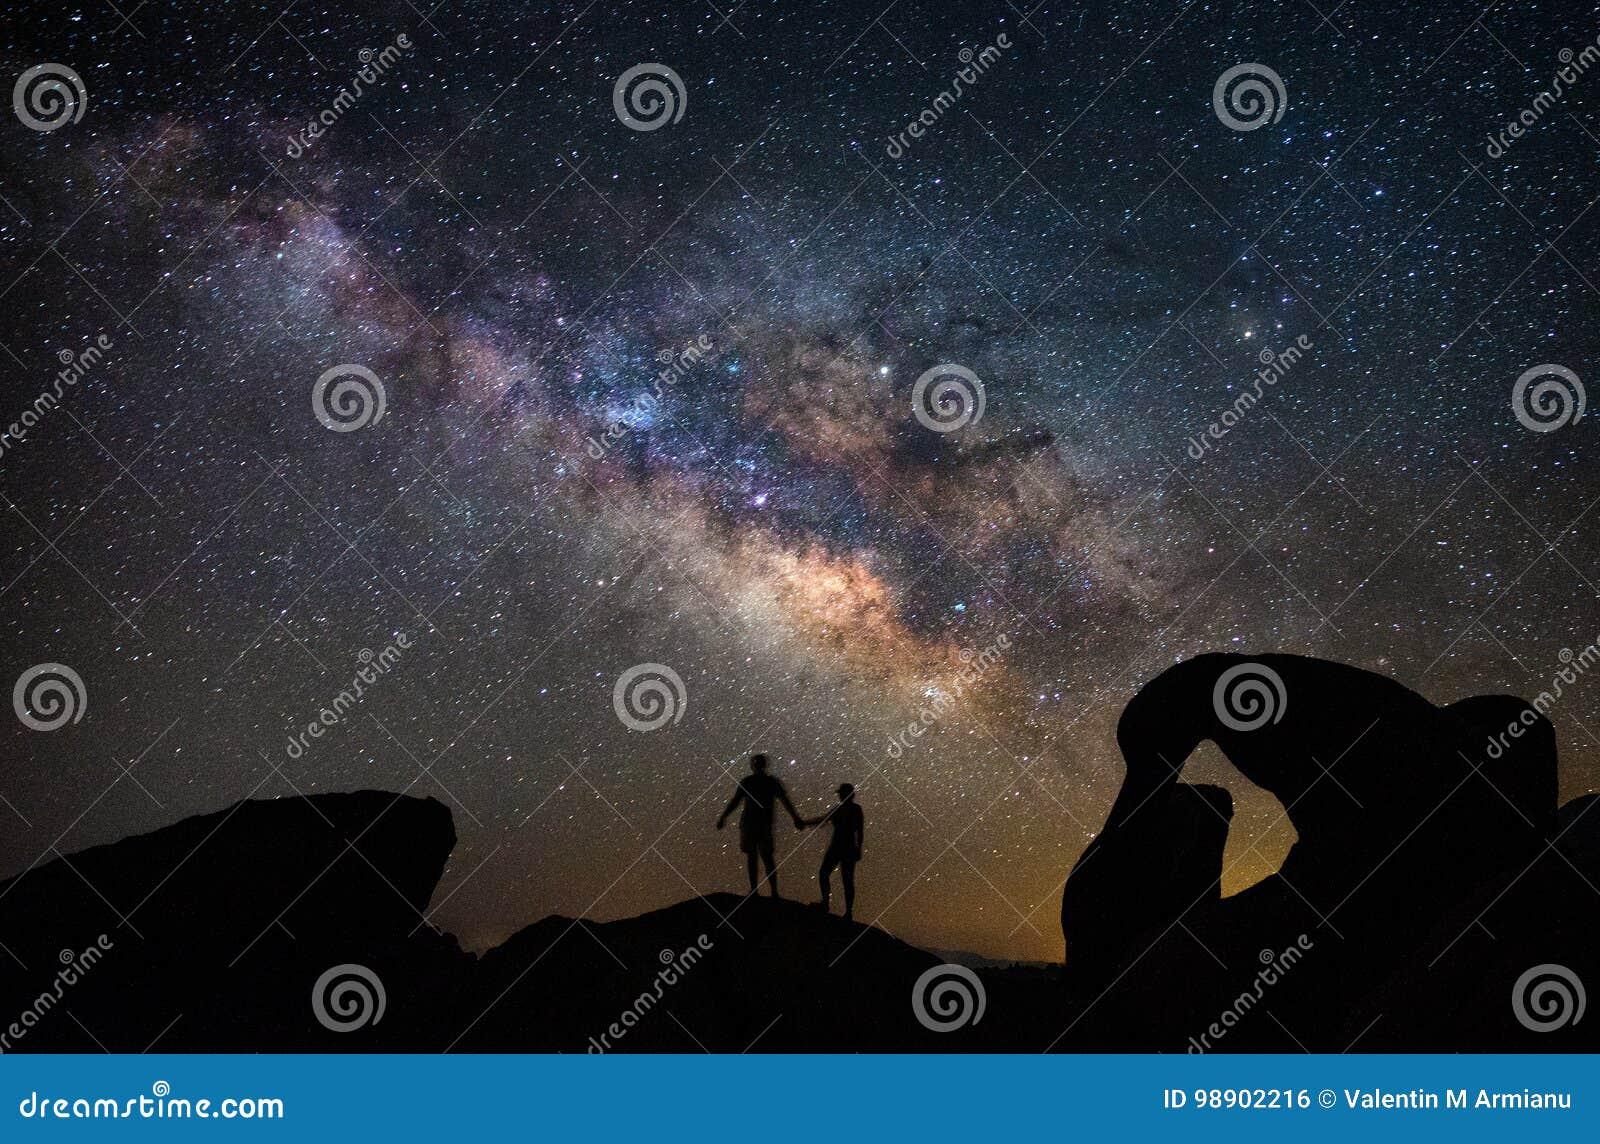 Mobius Arch in Alabama Hills under the Milky Way